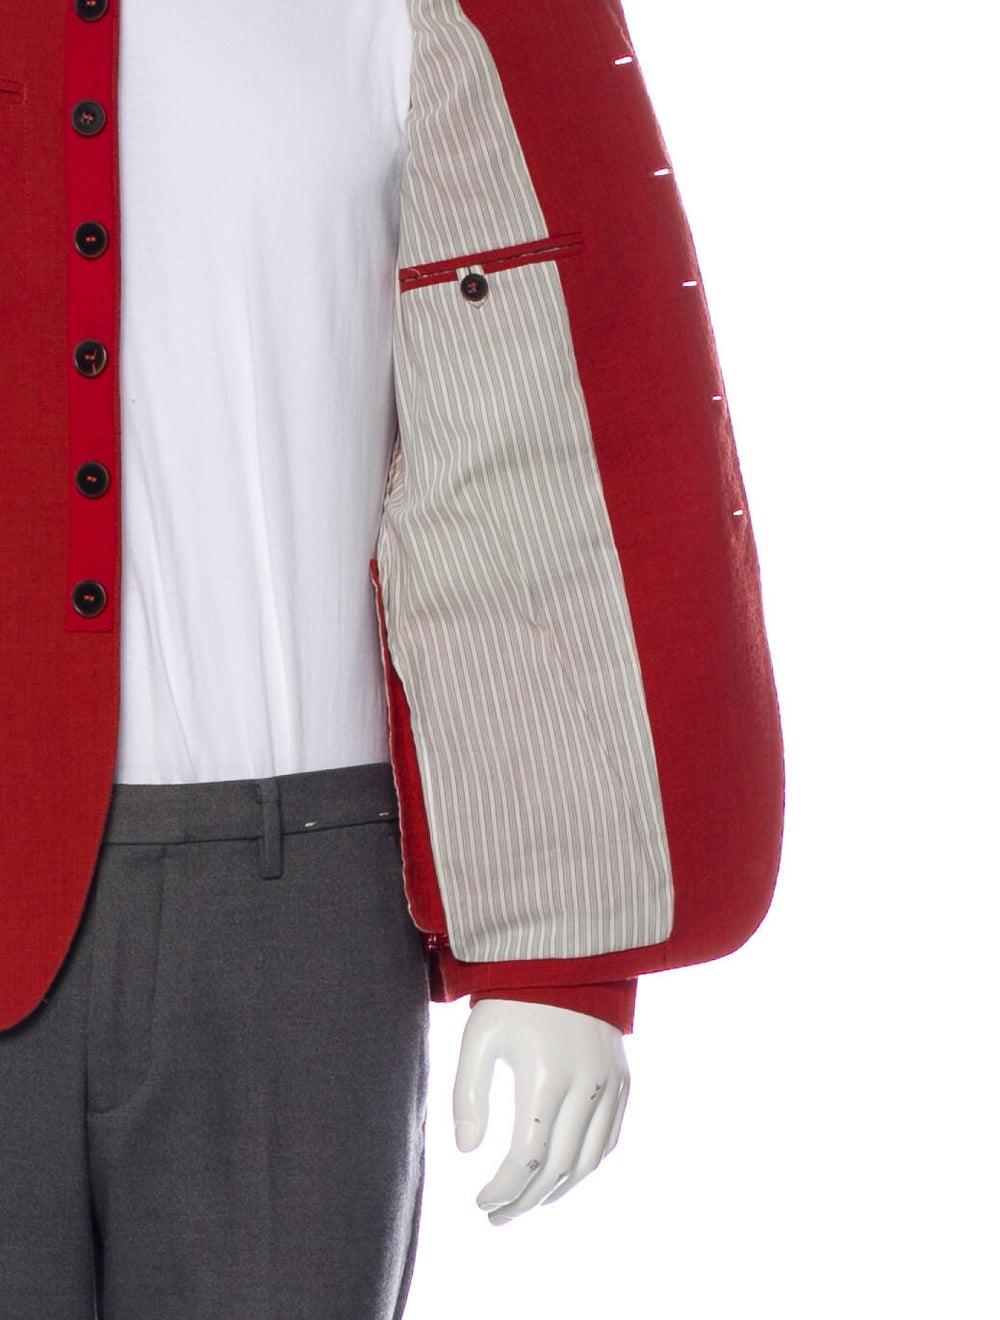 John Varvatos Deconstructed Sport Coat - image 4